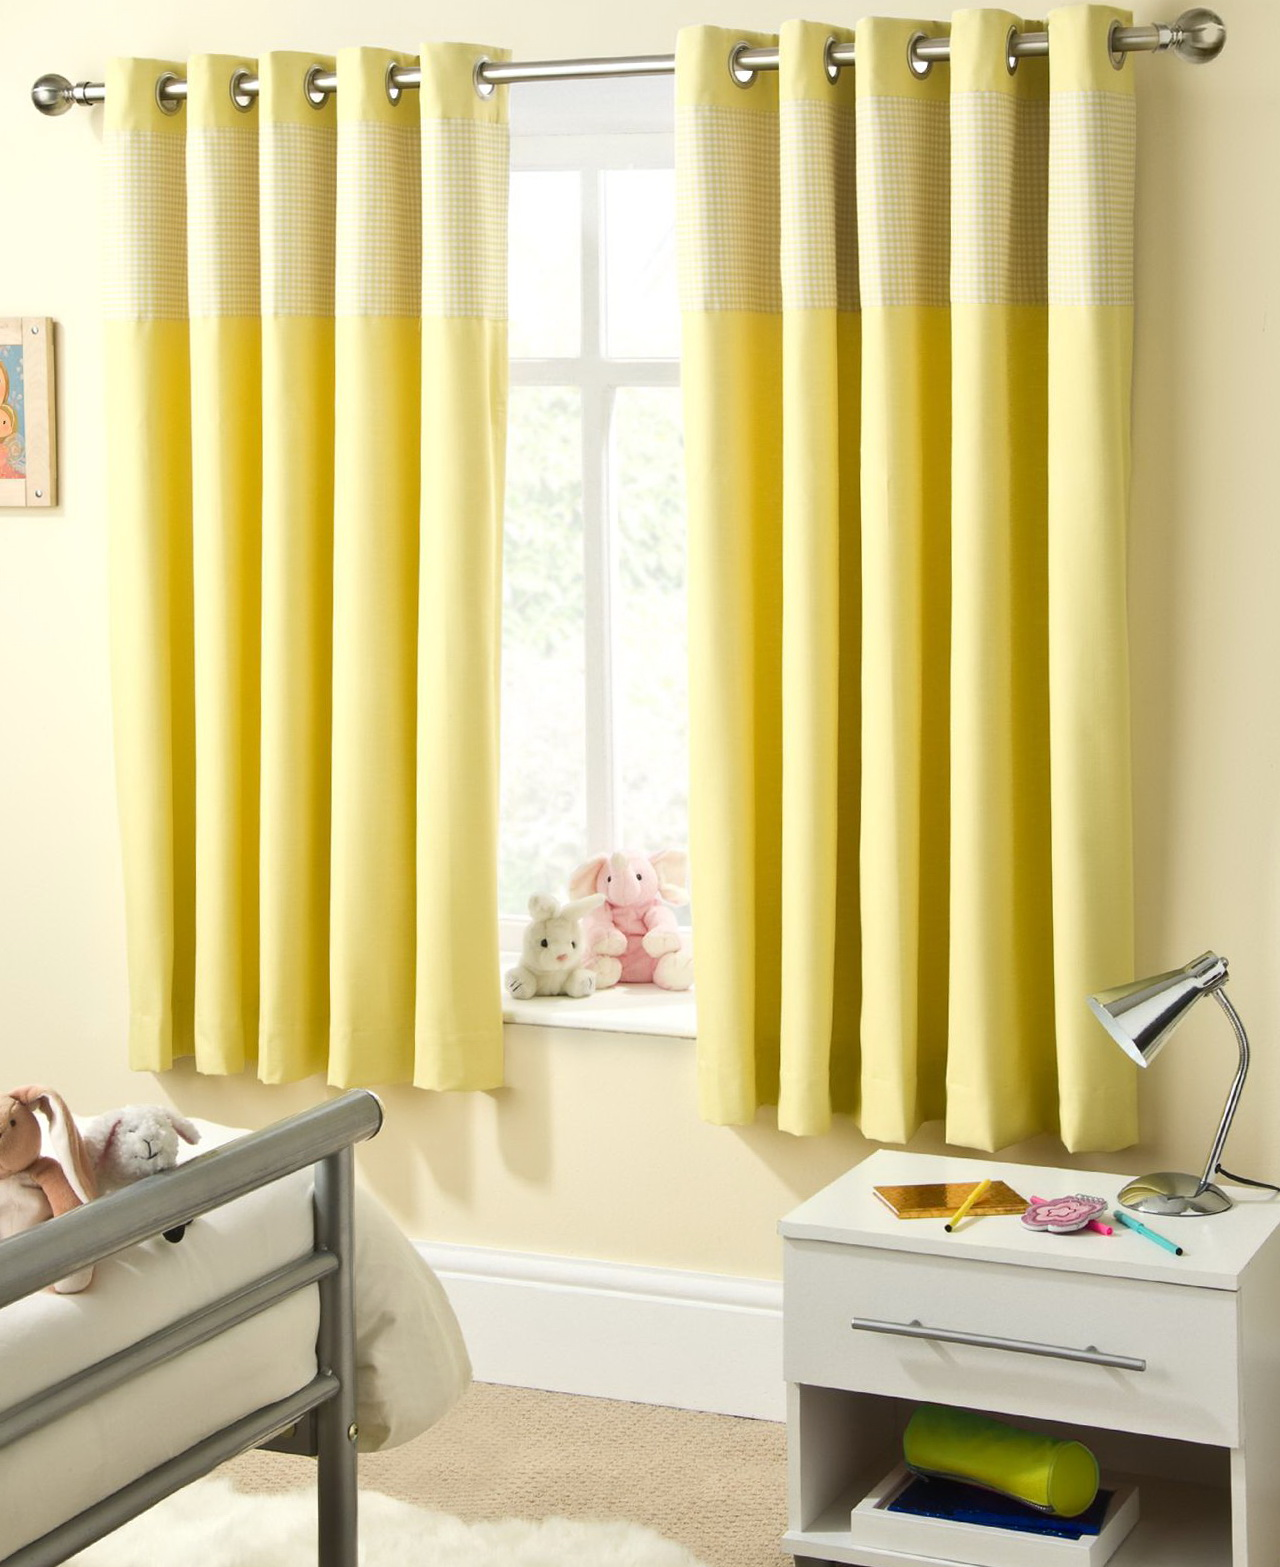 Ikea Curtains Blackout Blackout Curtains For Nursery Ikea Home Design Ideas